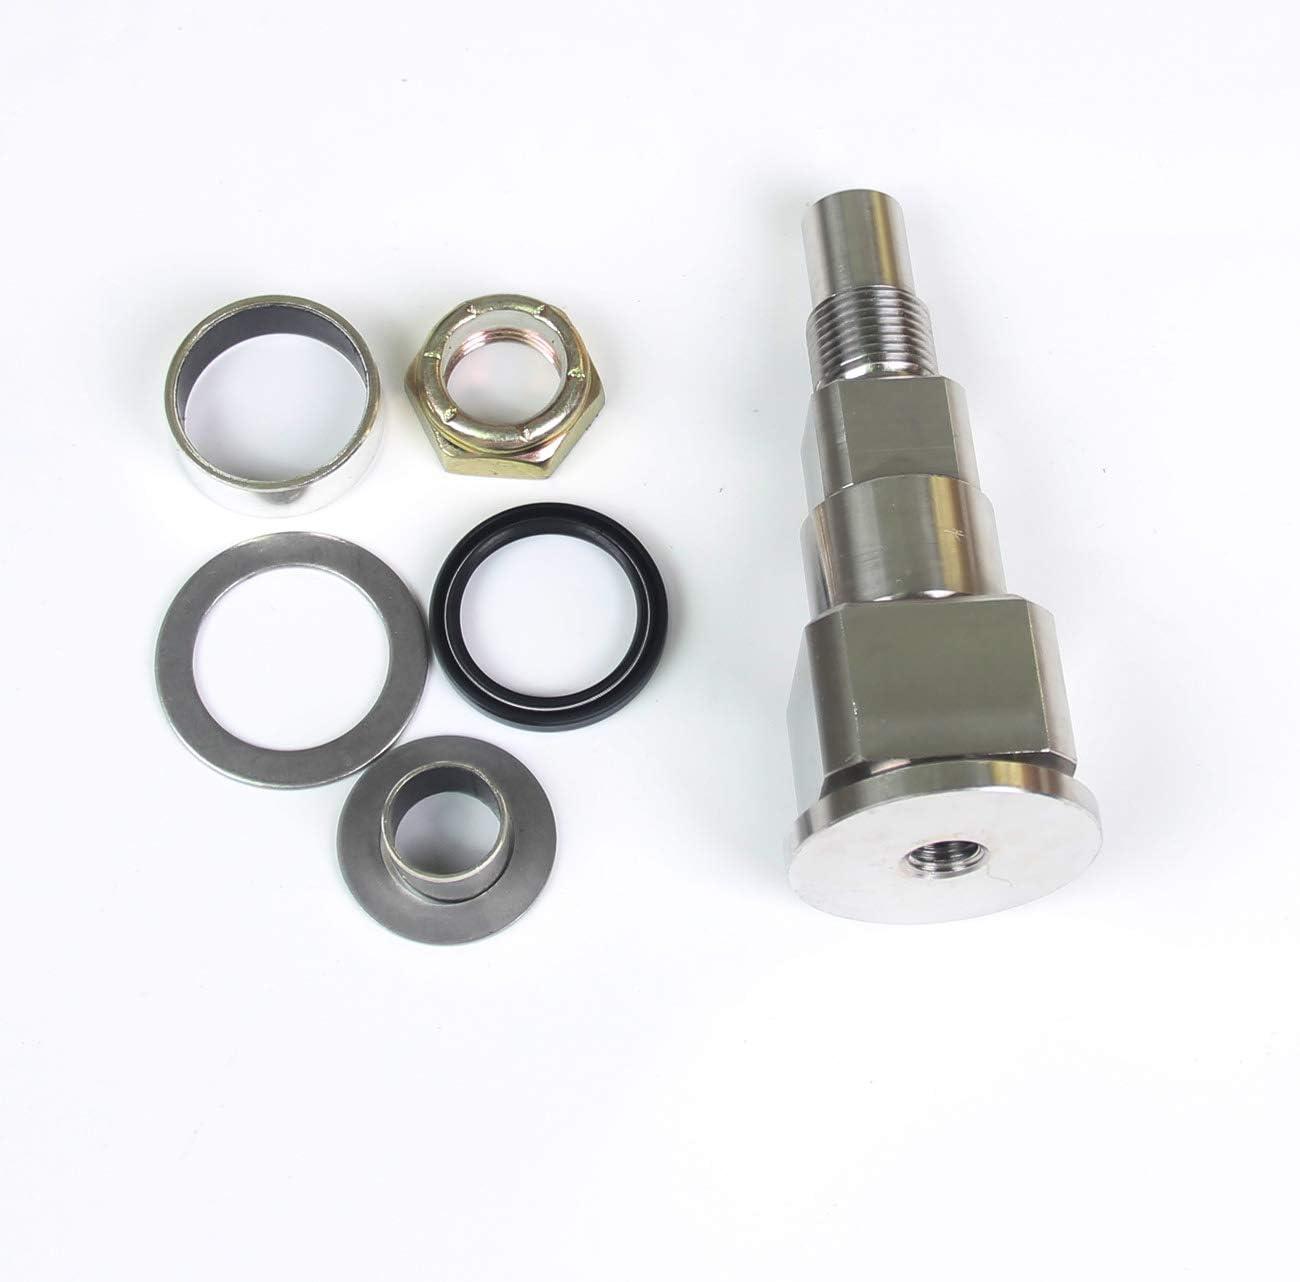 New Gimbal Steering Shaft Pin Seal Bushing Kit for MerCruiser Alpha Bravo Replace 98230A1 866718A01